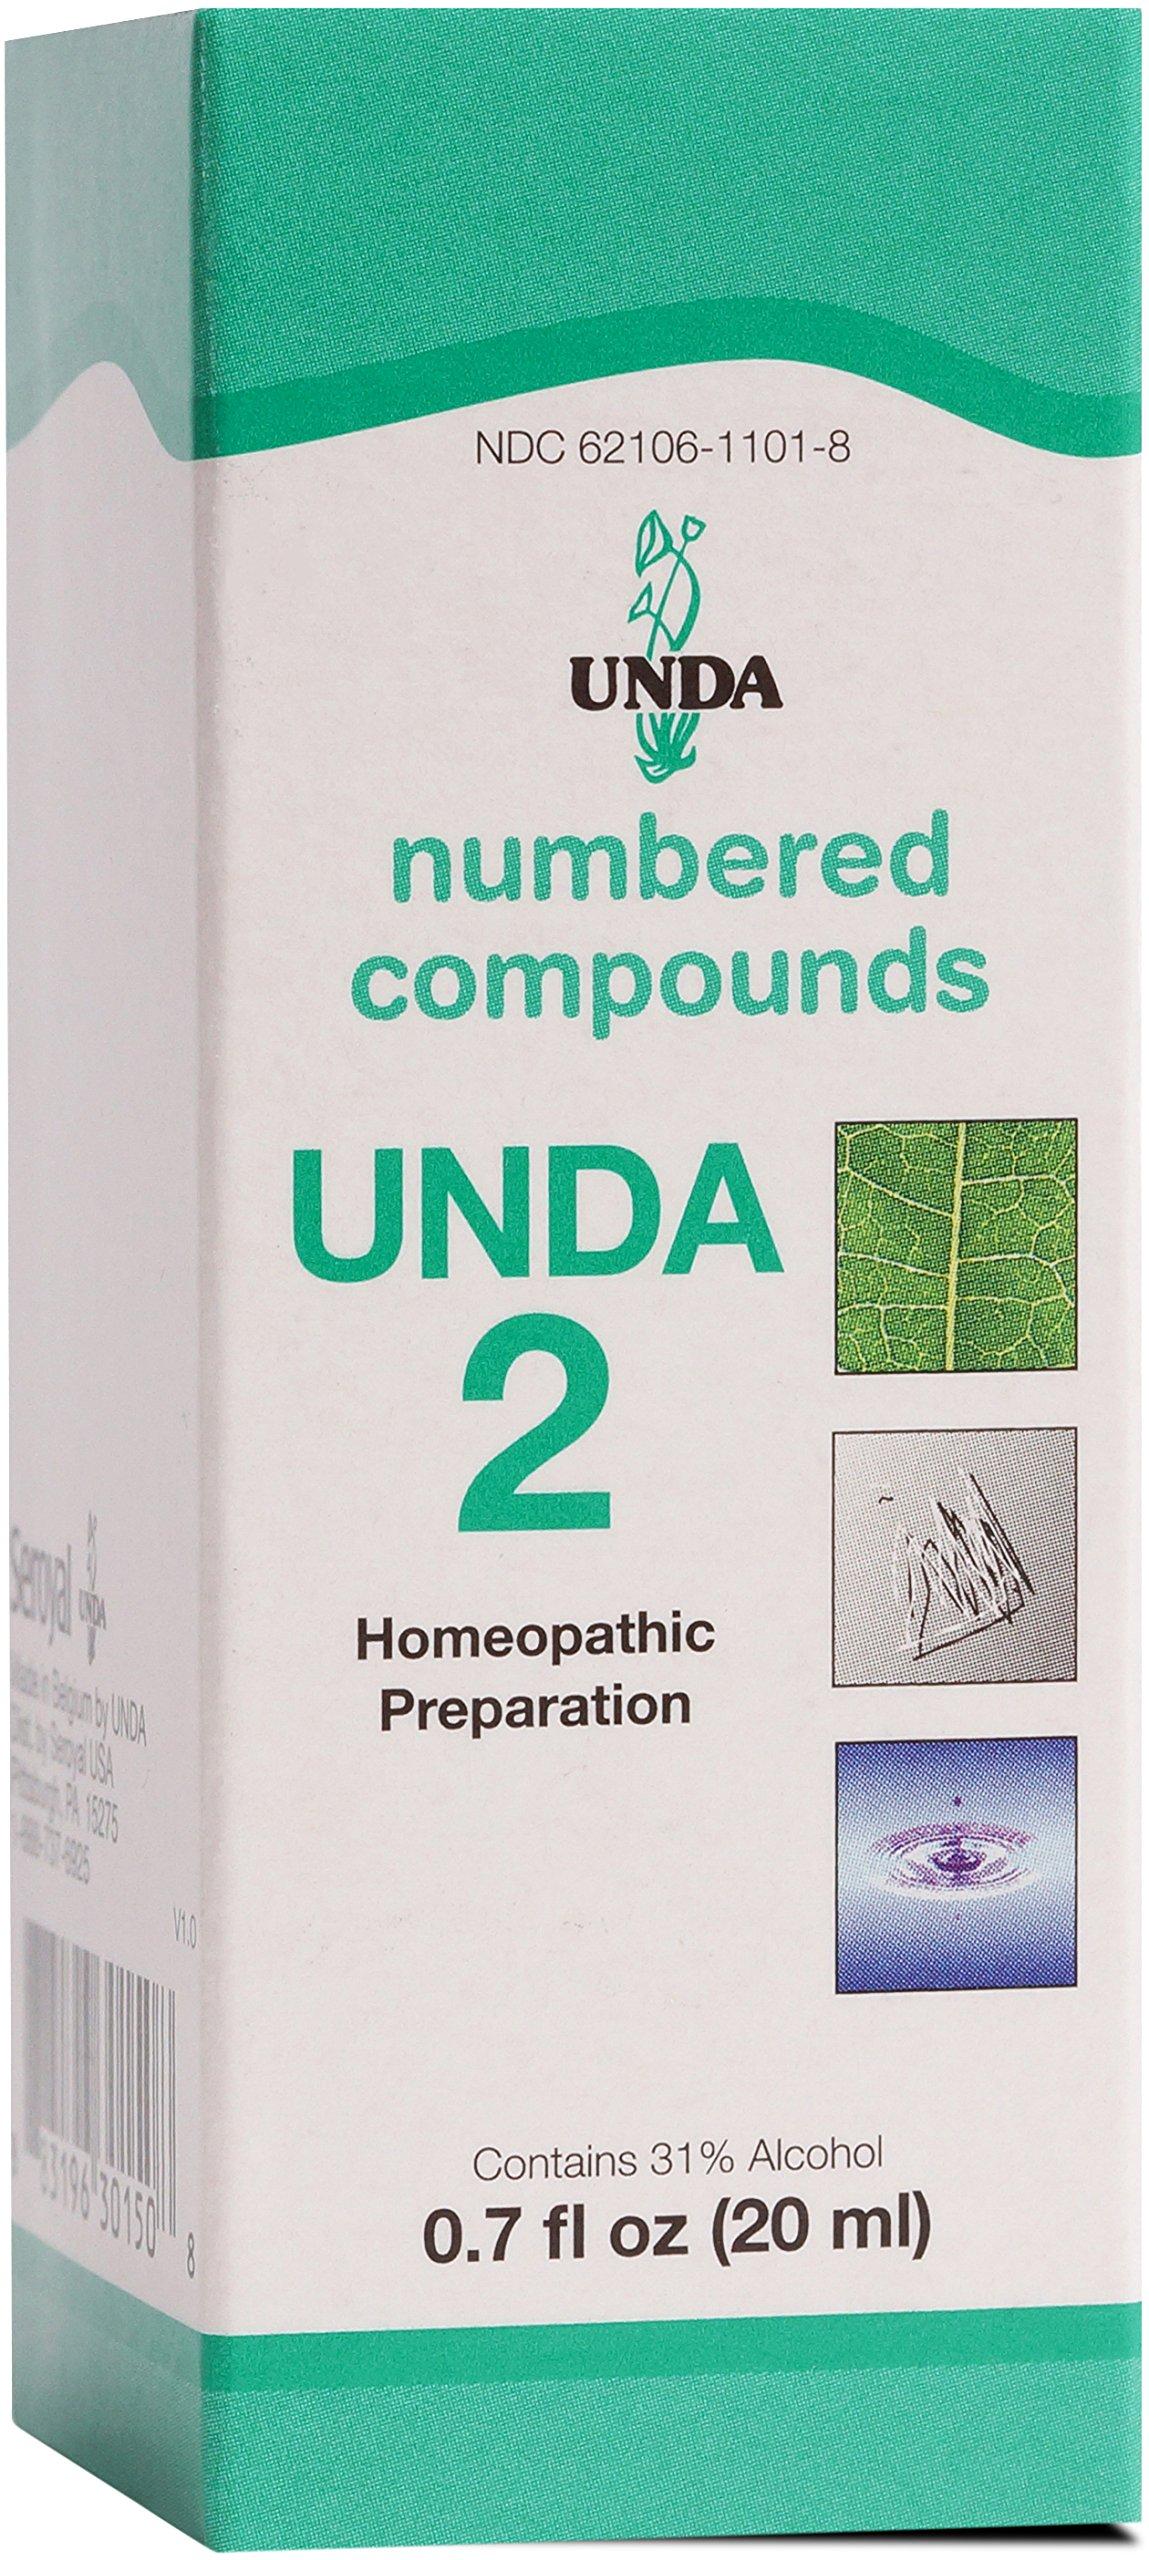 UNDA - UNDA 2 Numbered Compounds - Homeopathic Preparation - 0.7 fl. oz.